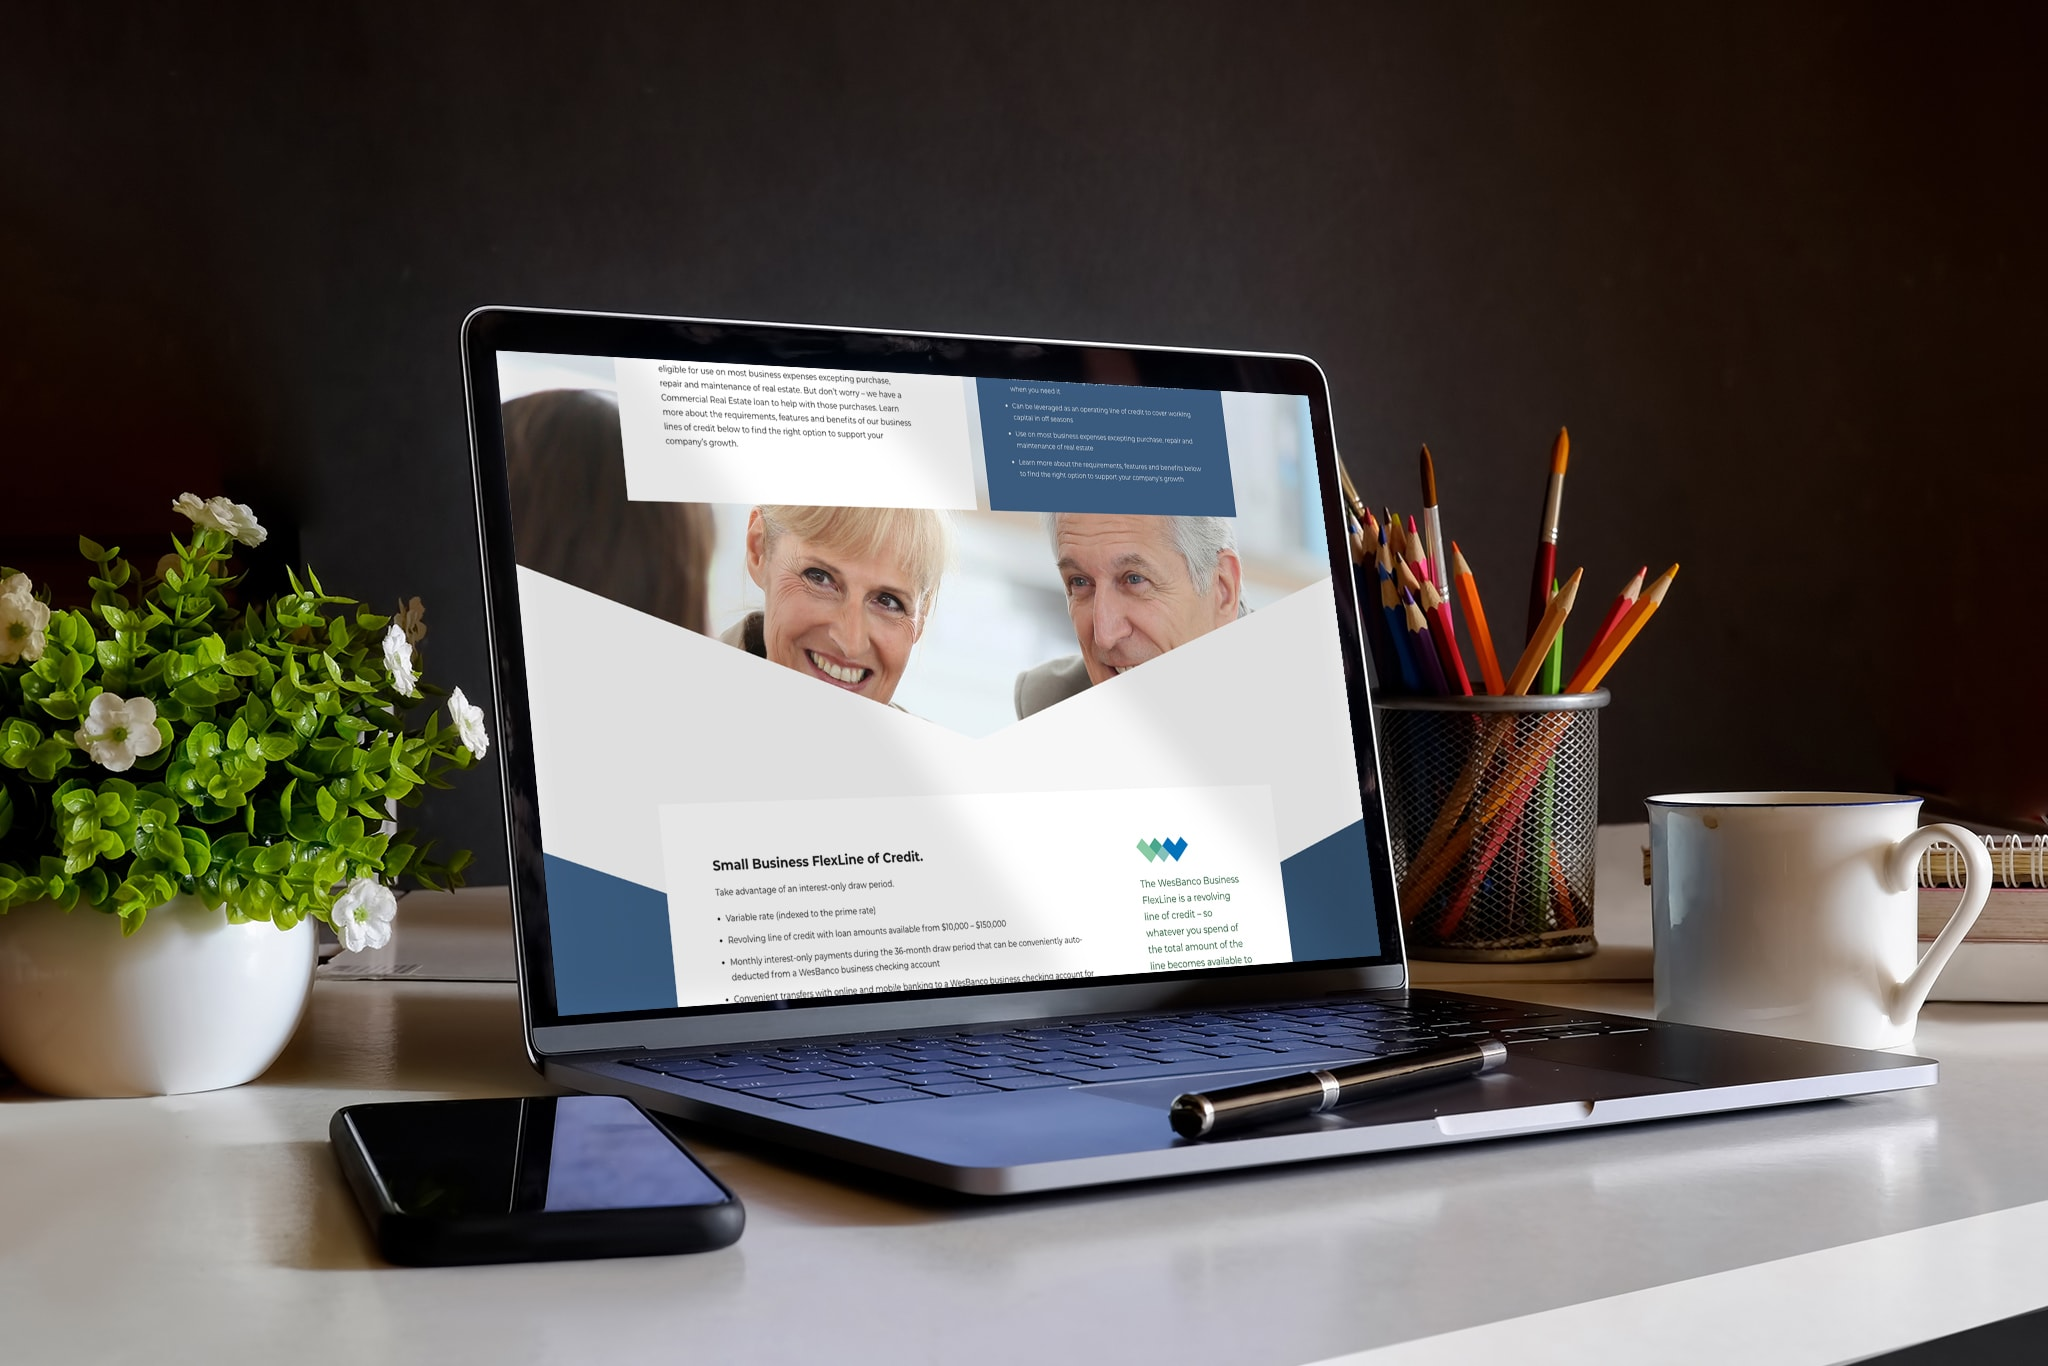 Image of website on laptop